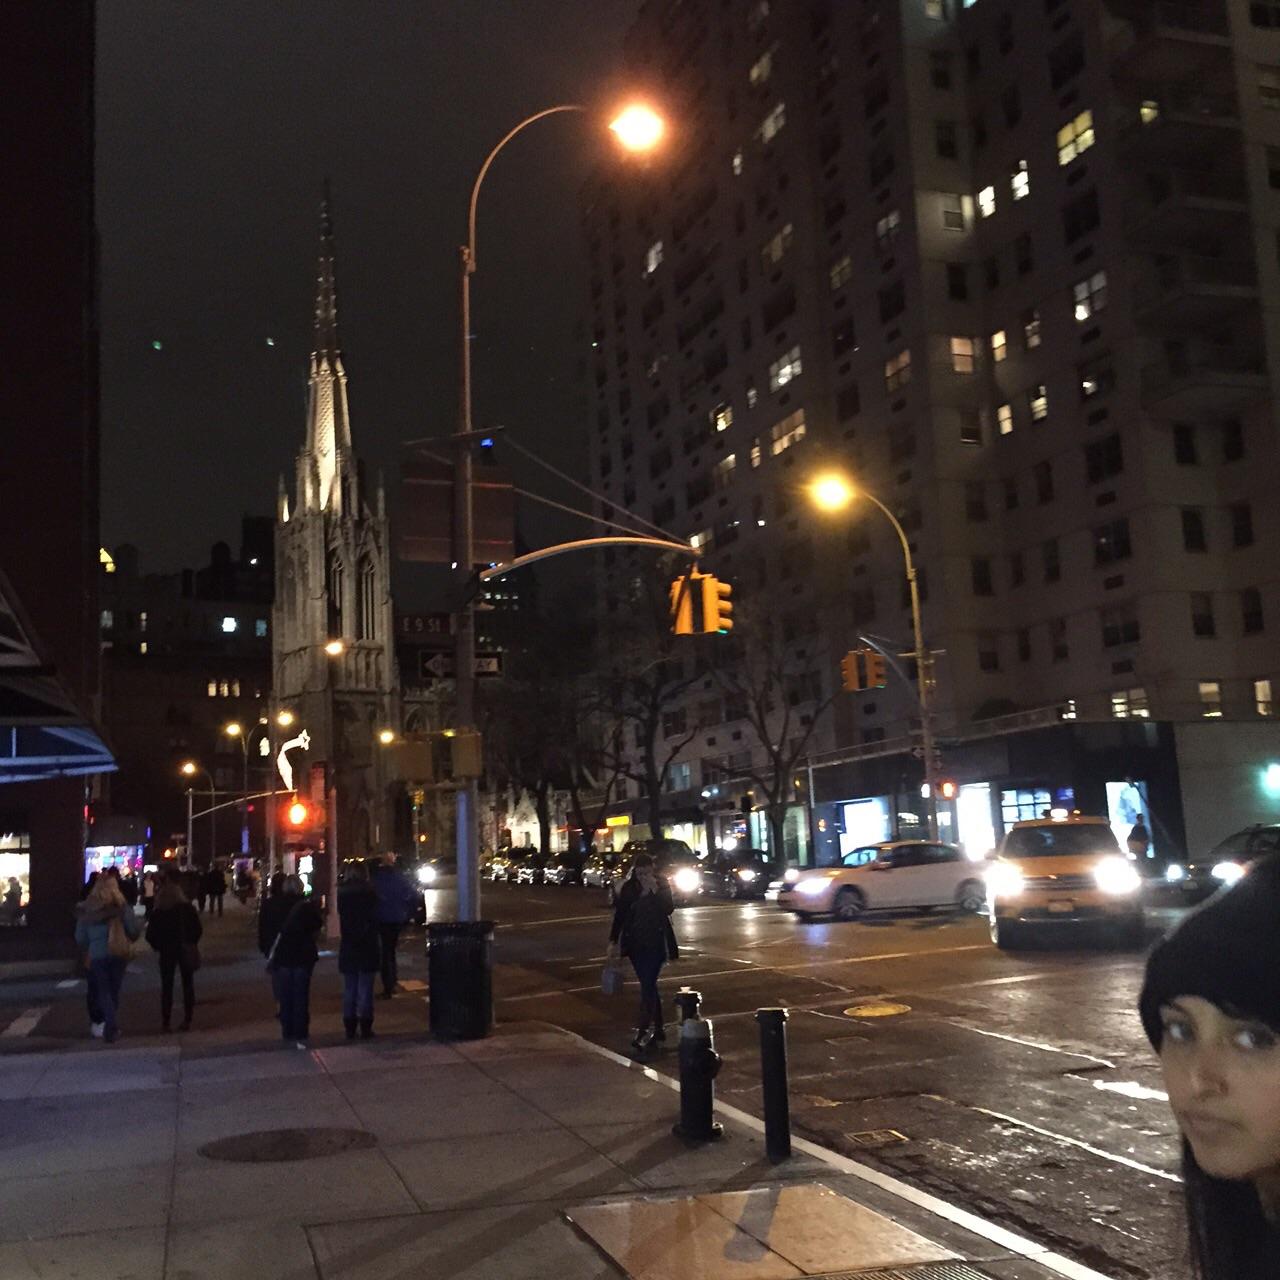 Hudson hotel new york nyc 2013 003 - Taken By Jainita Patel